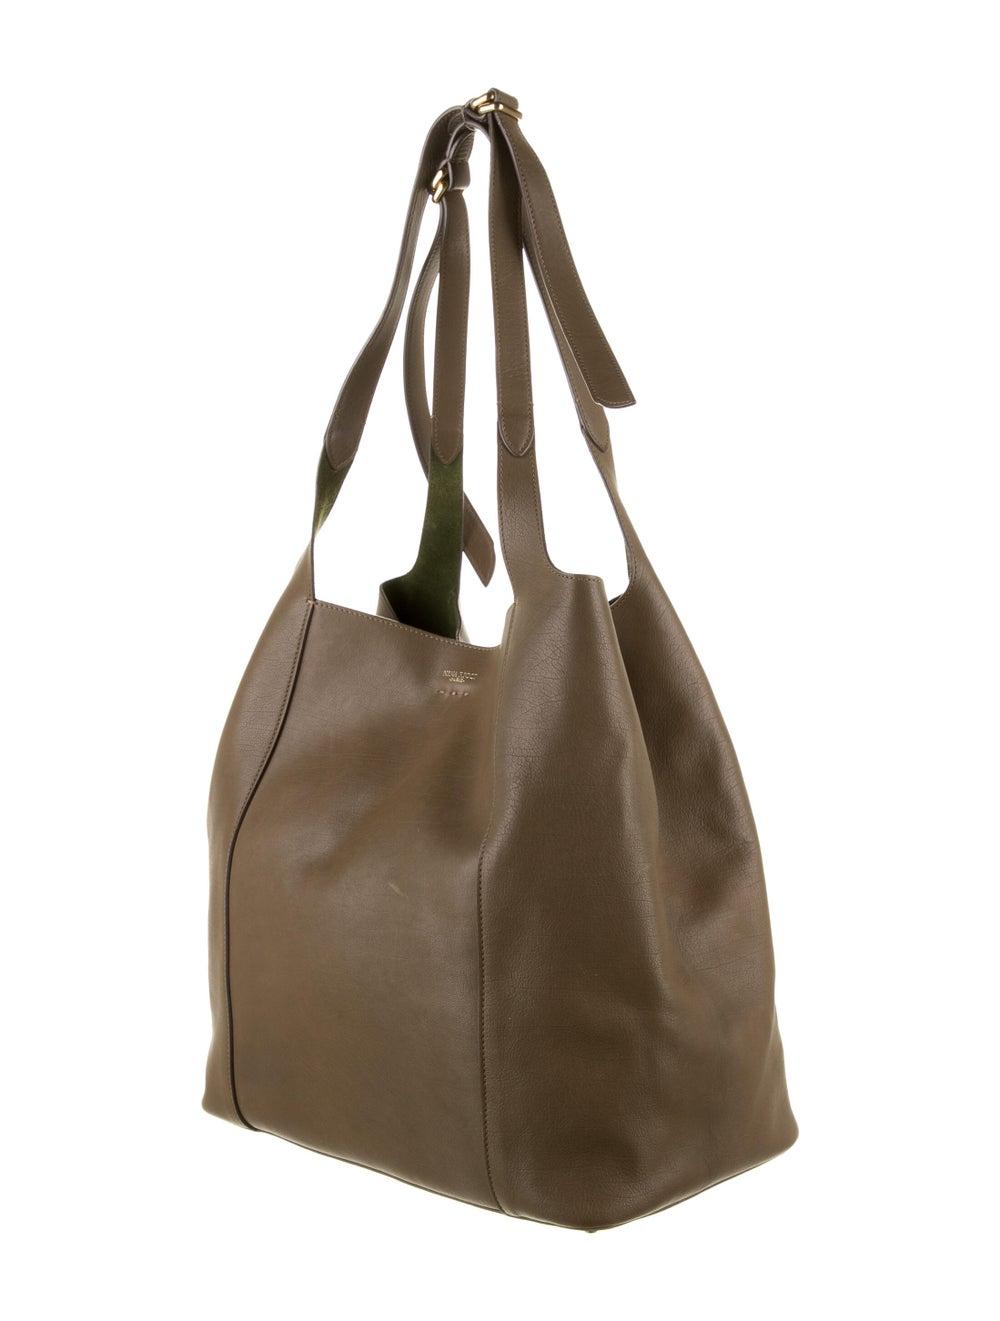 Nina Ricci Leather Tote Bag Brown - image 3